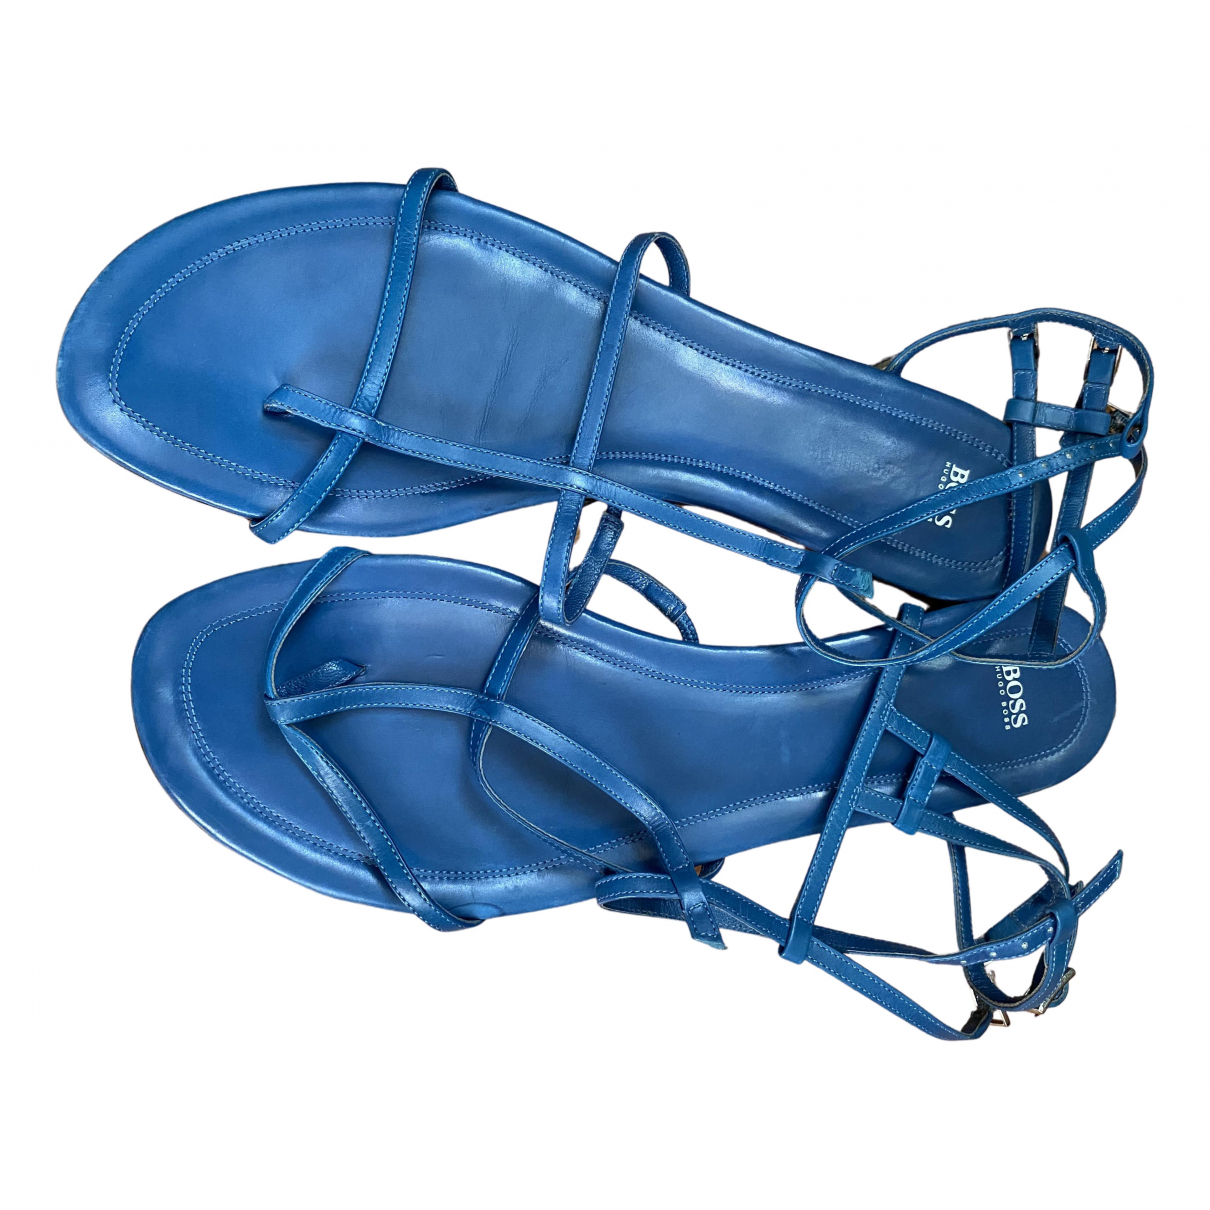 Boss N Blue Leather Sandals for Women 41 EU